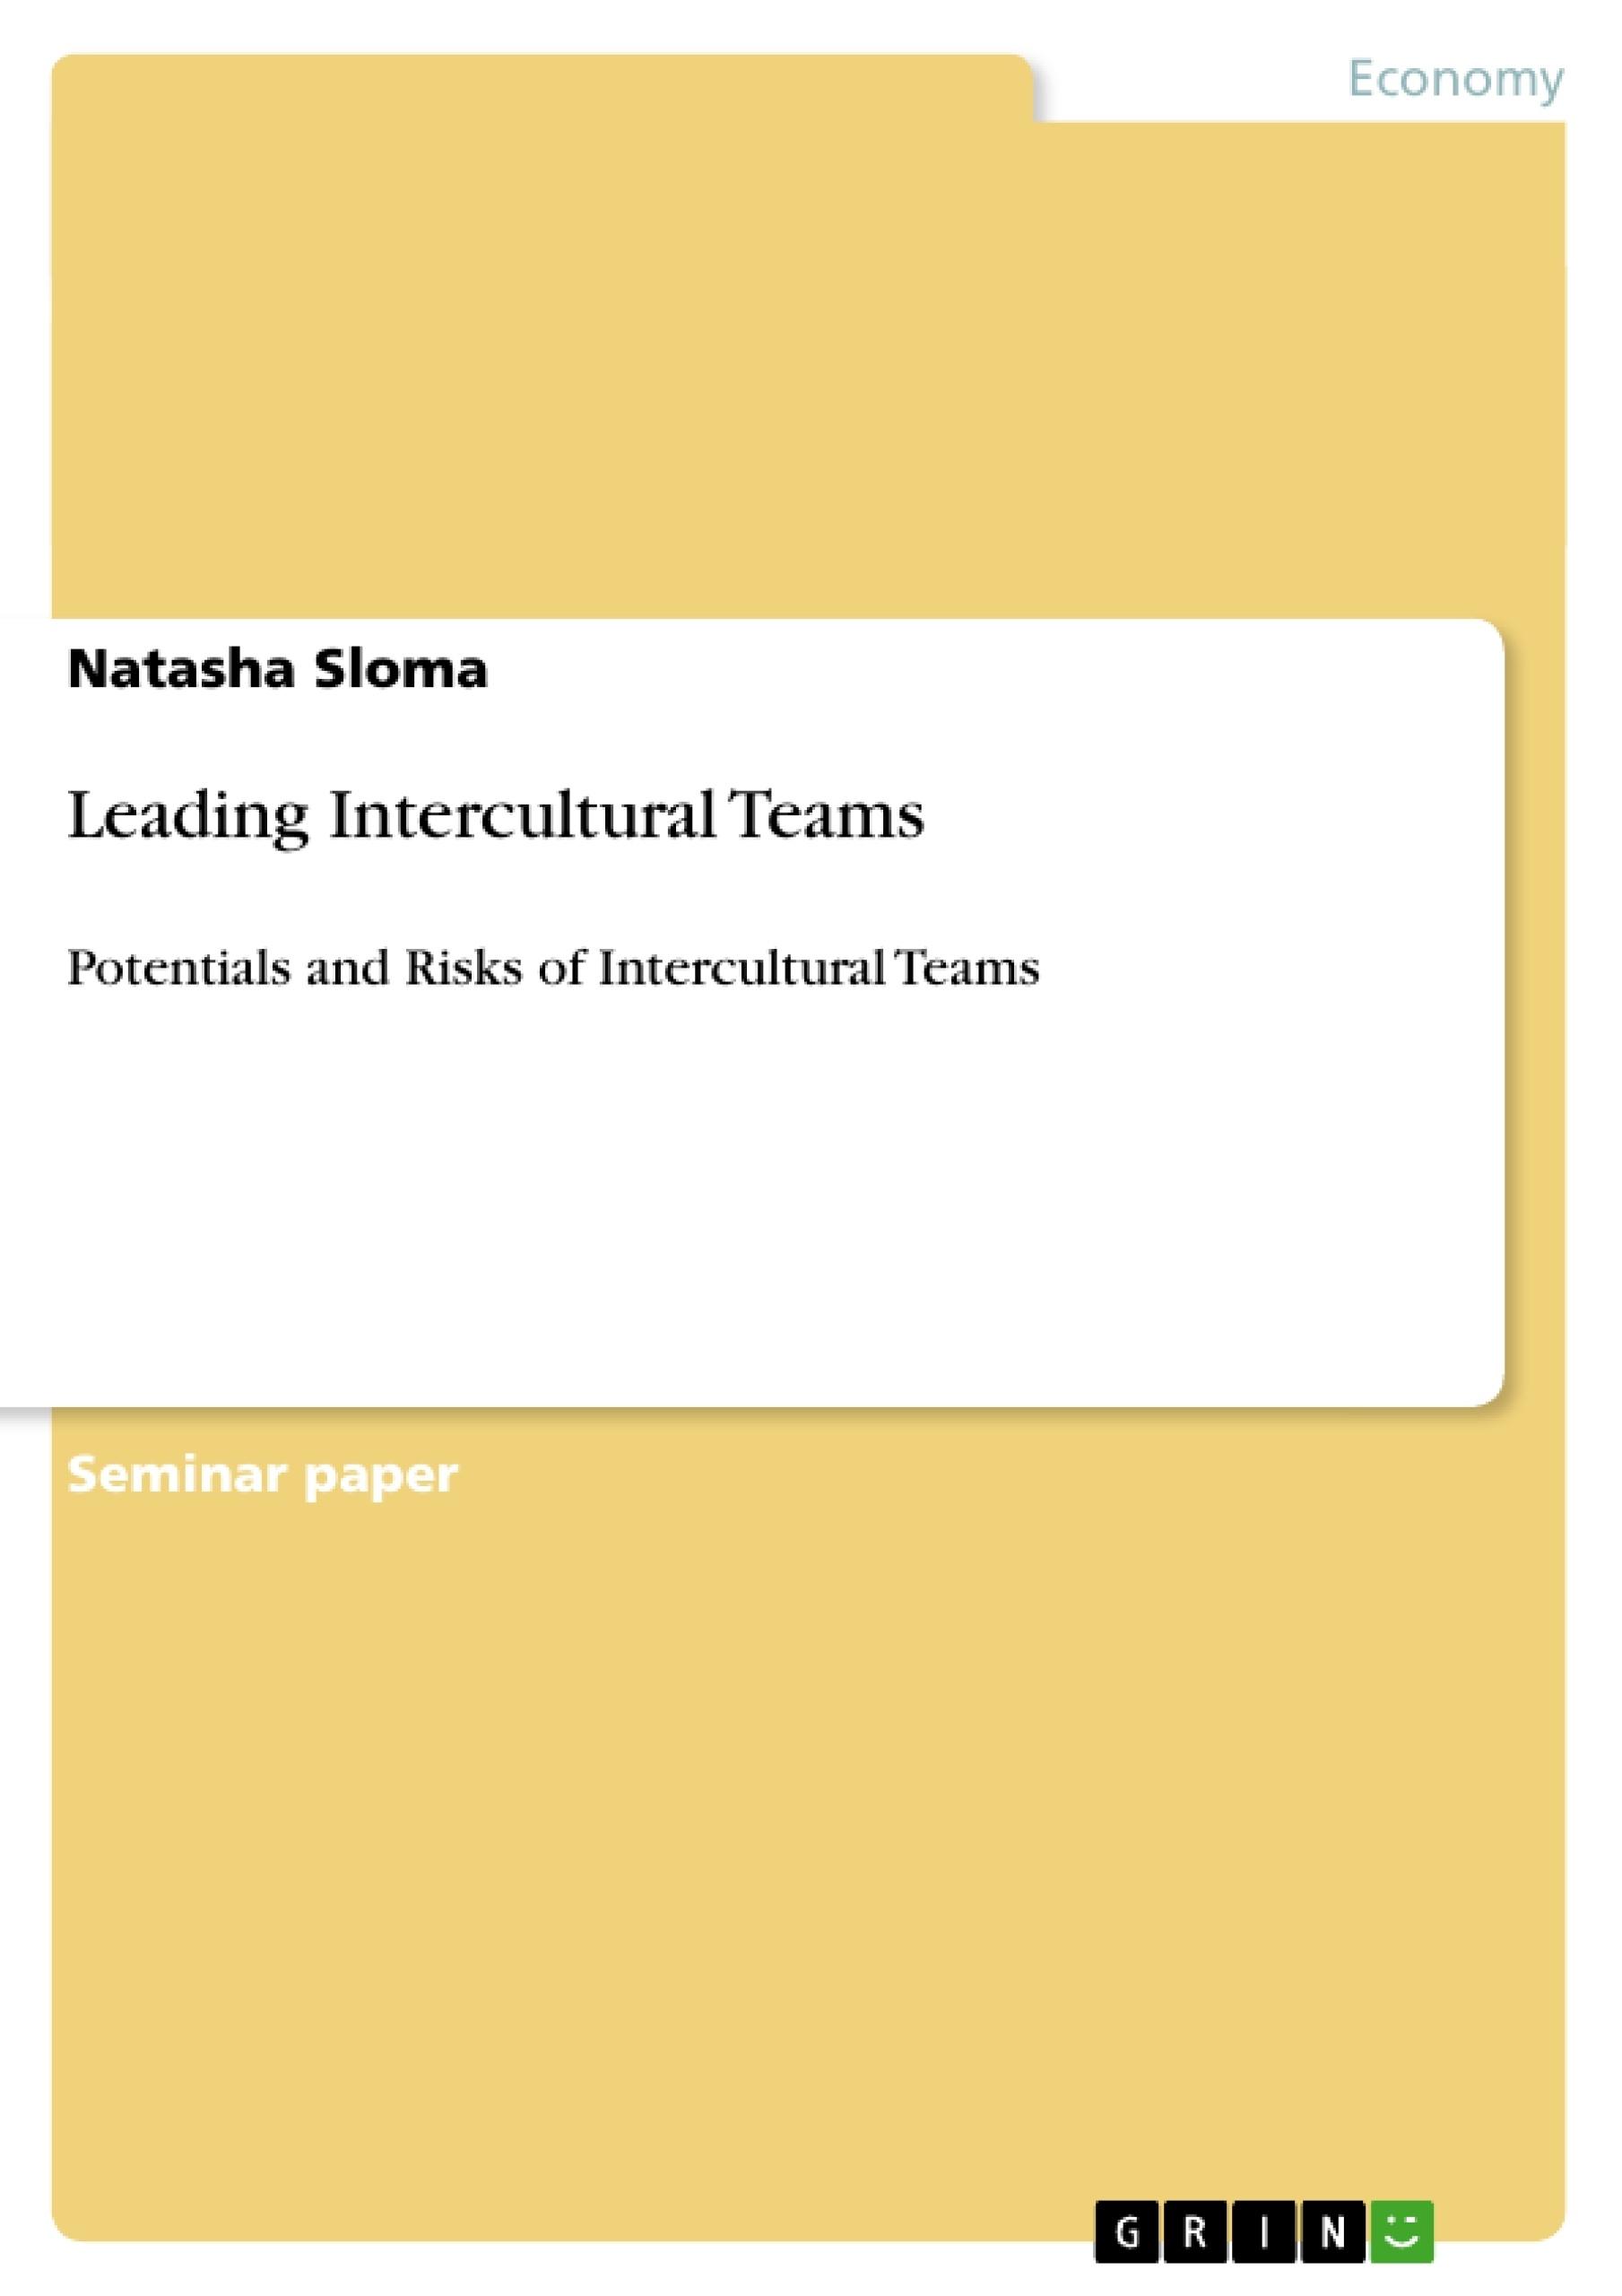 Title: Leading Intercultural Teams